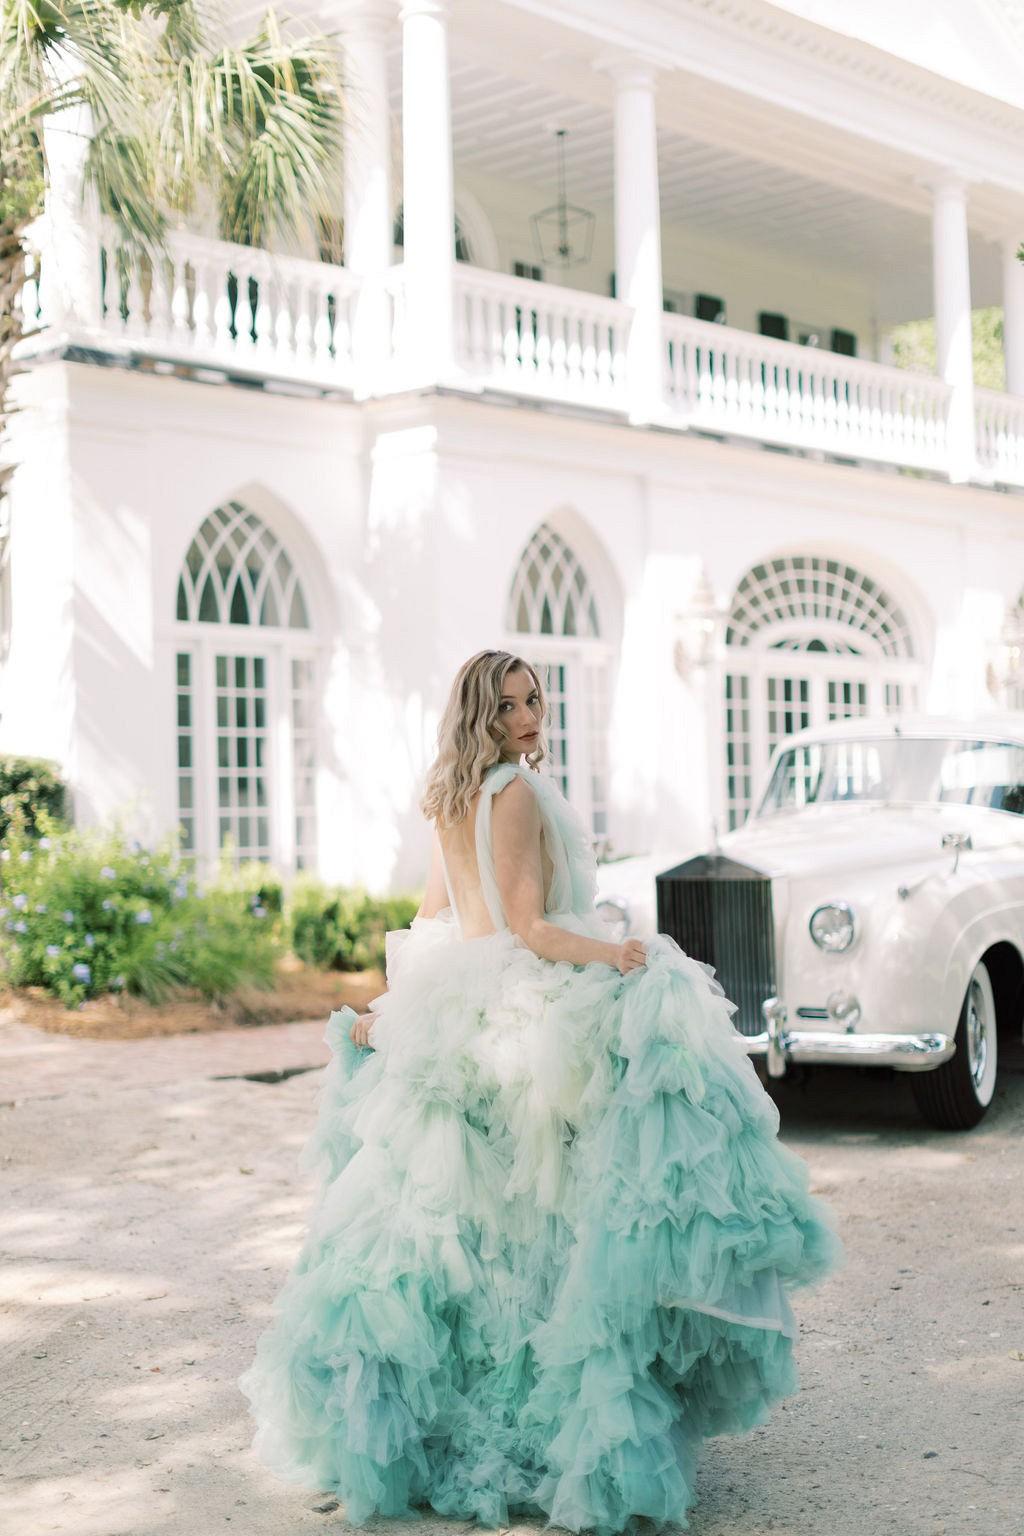 Destination wedding planner Krissy Campbell